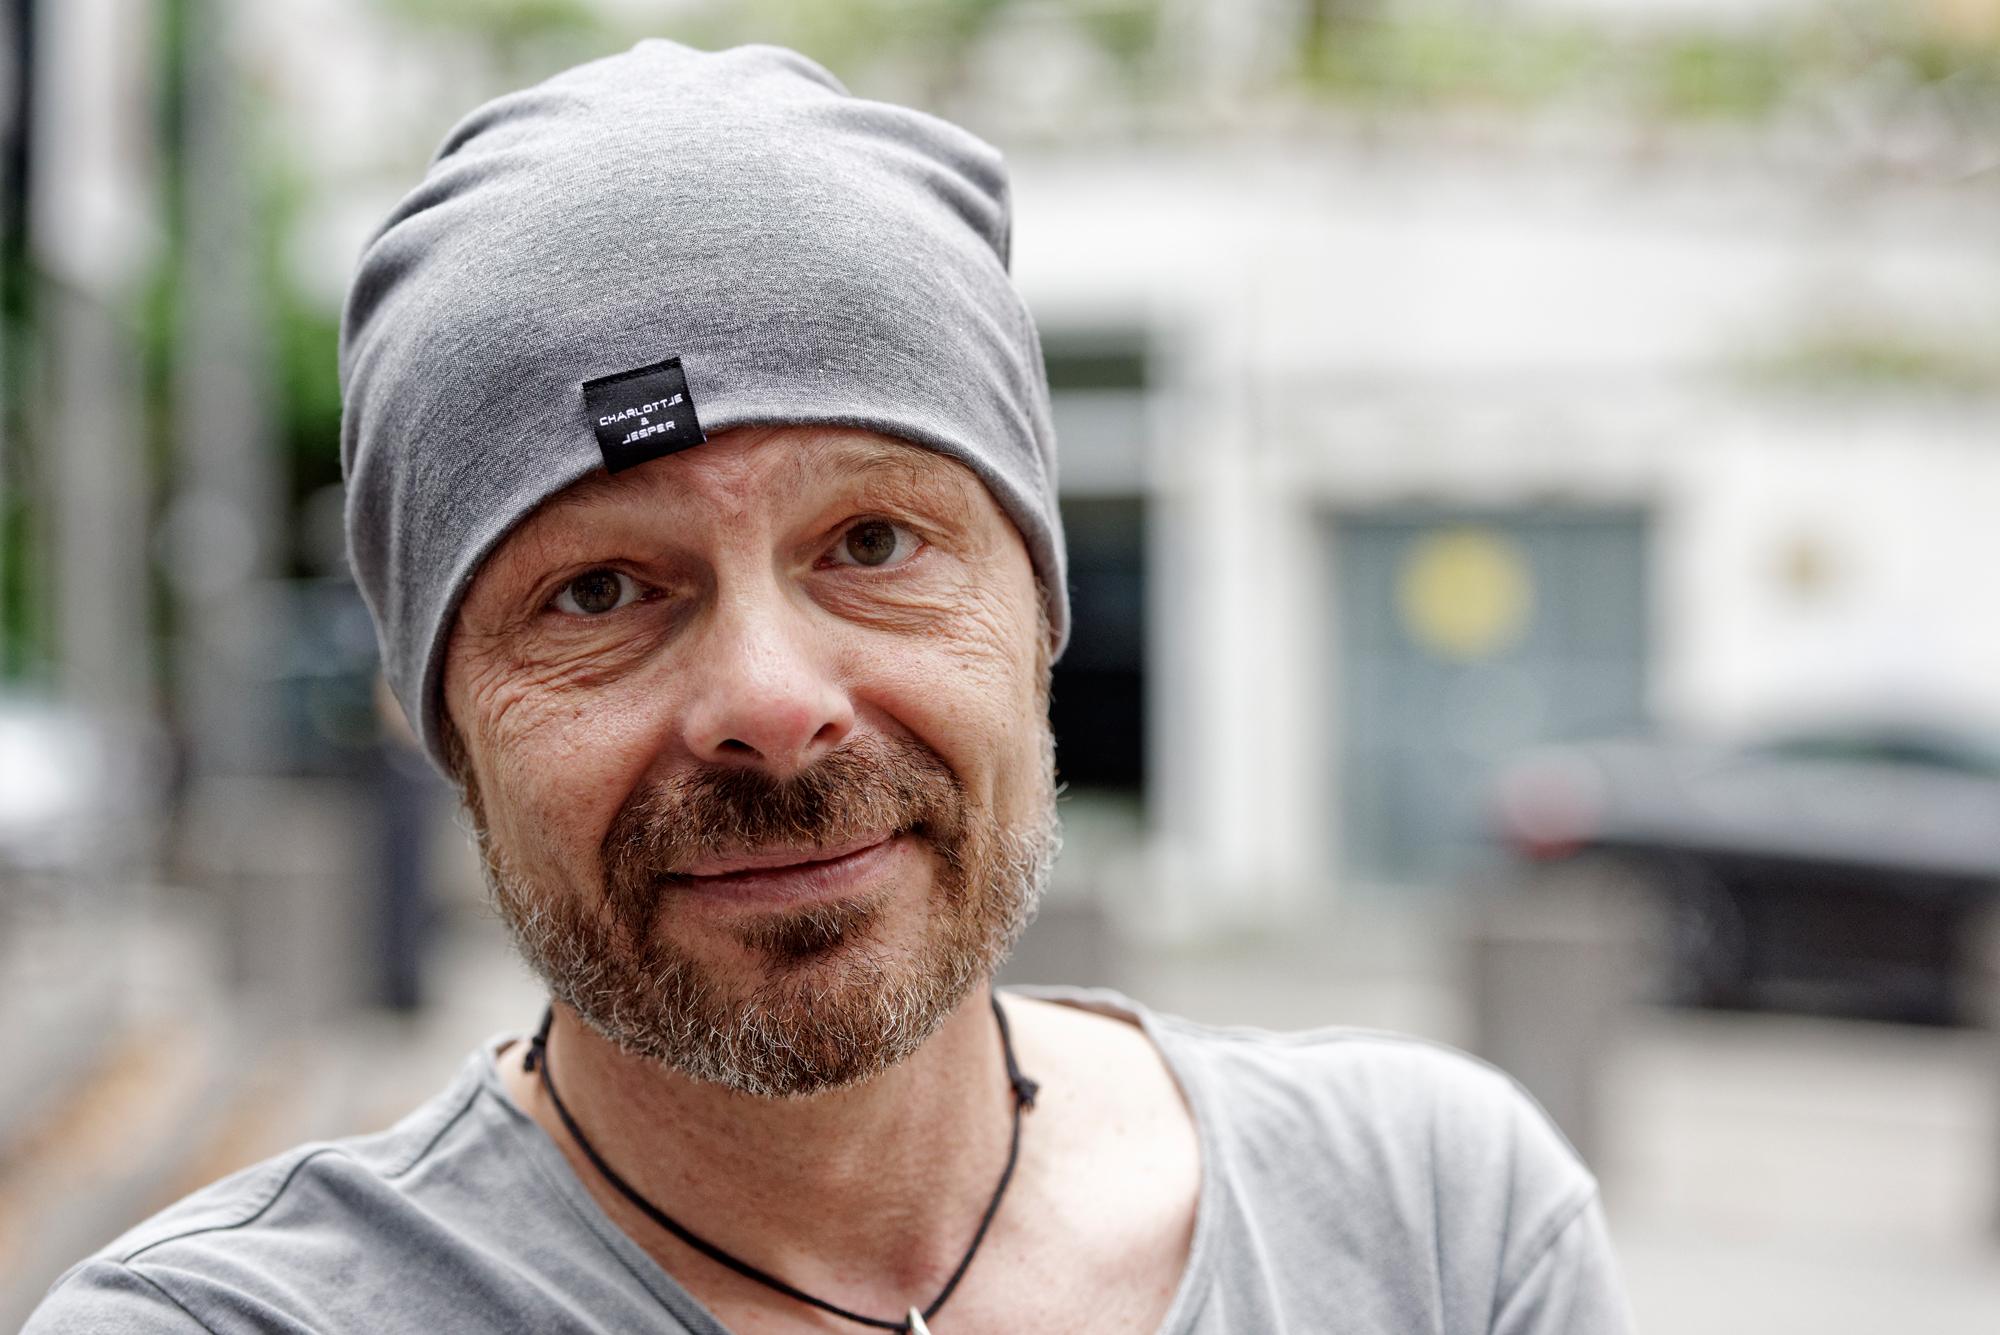 Christoph Schultz begleitet Danger als Reporter